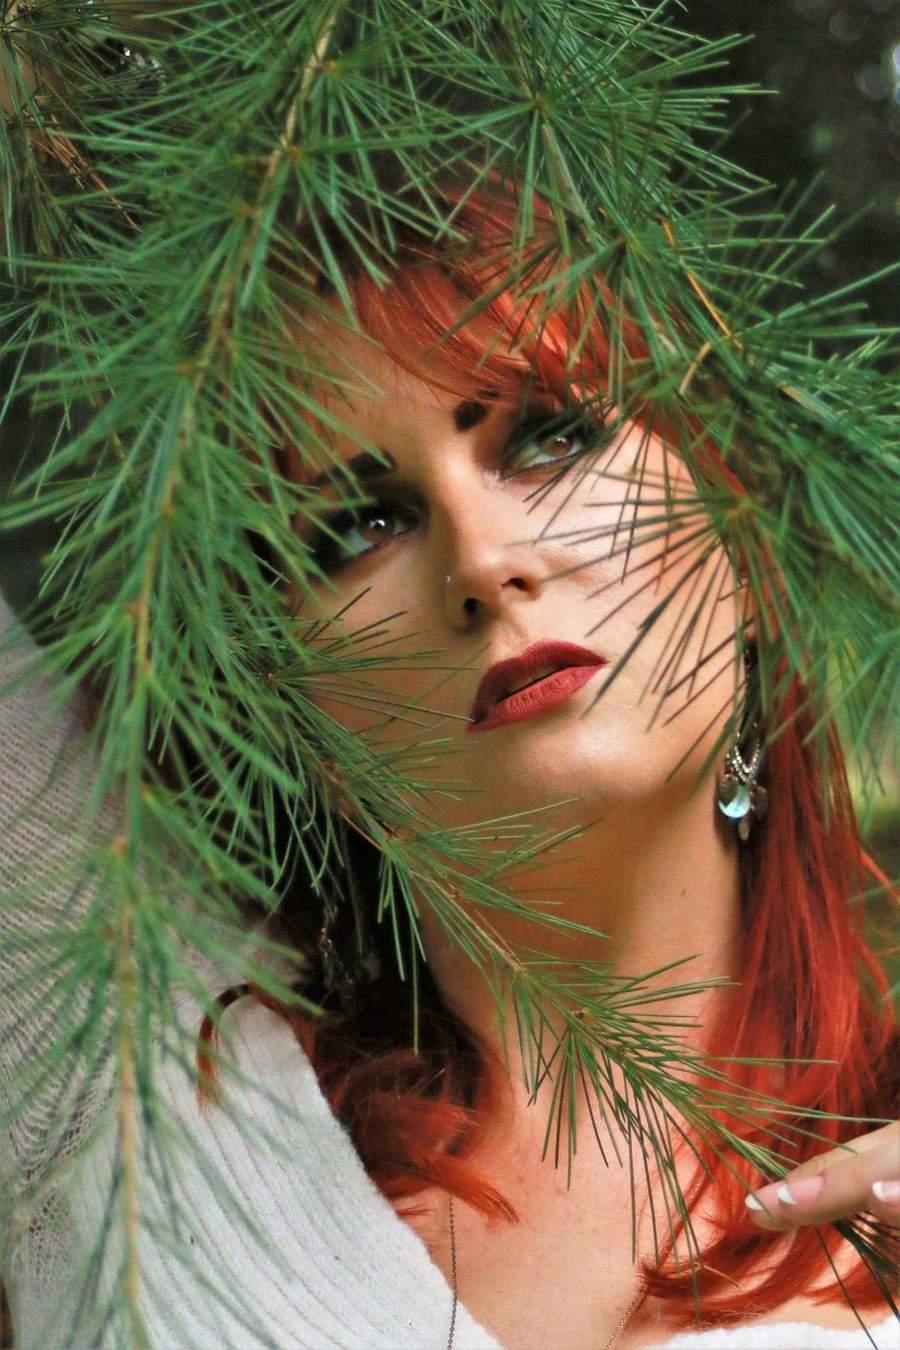 Lost in Nature / Model Alex Kelsey, Makeup by Alex Kelsey / Uploaded 6th September 2018 @ 11:00 PM